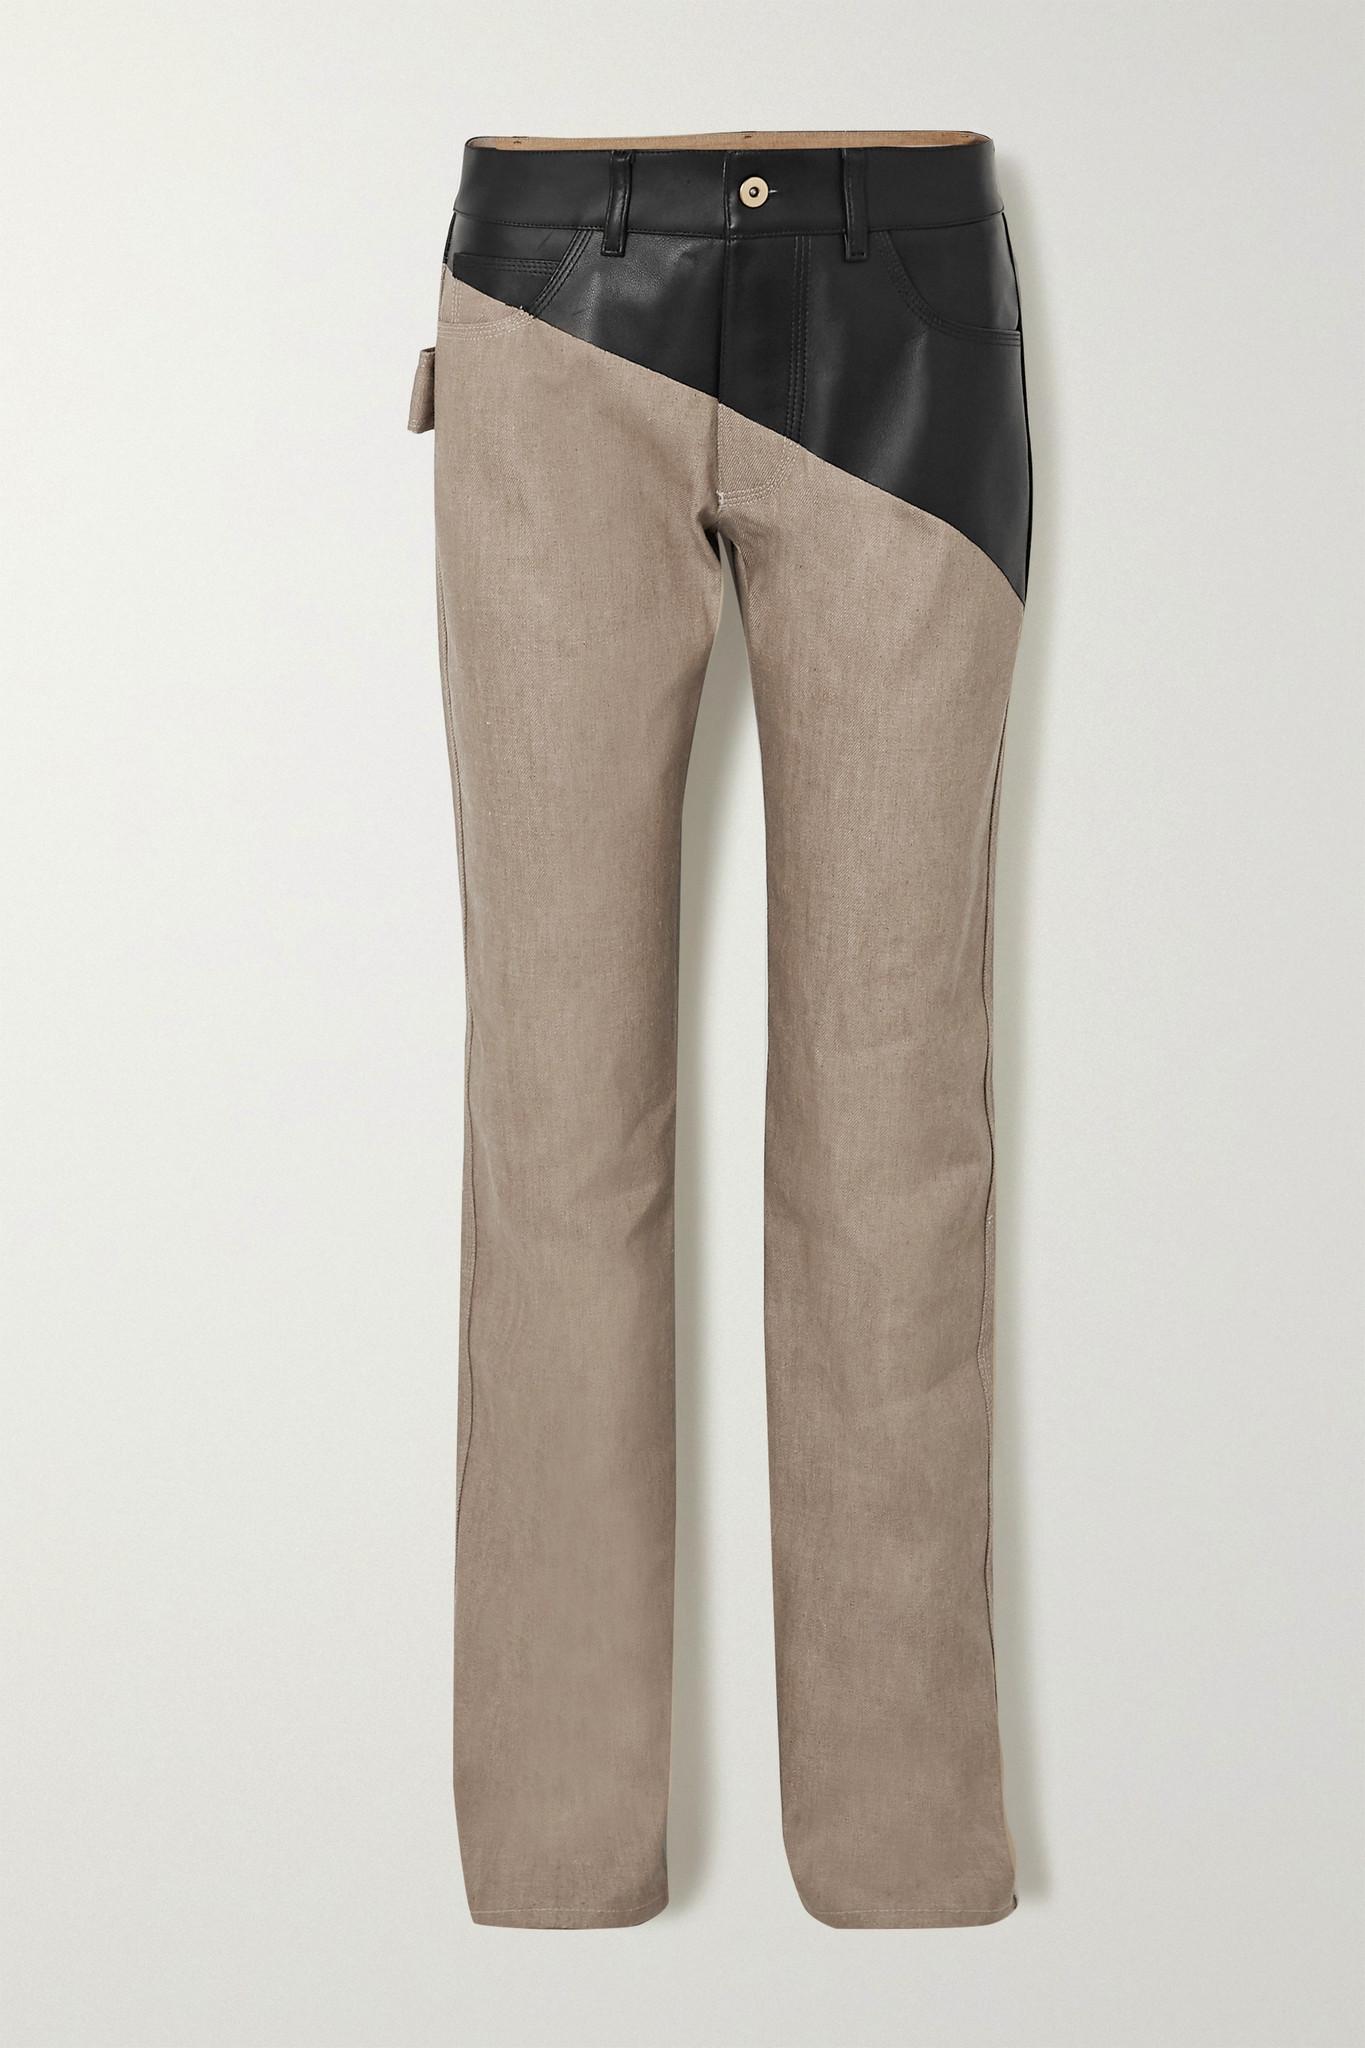 BOTTEGA VENETA - Leather-paneled High-rise Straight-leg Jeans - Neutrals - IT40